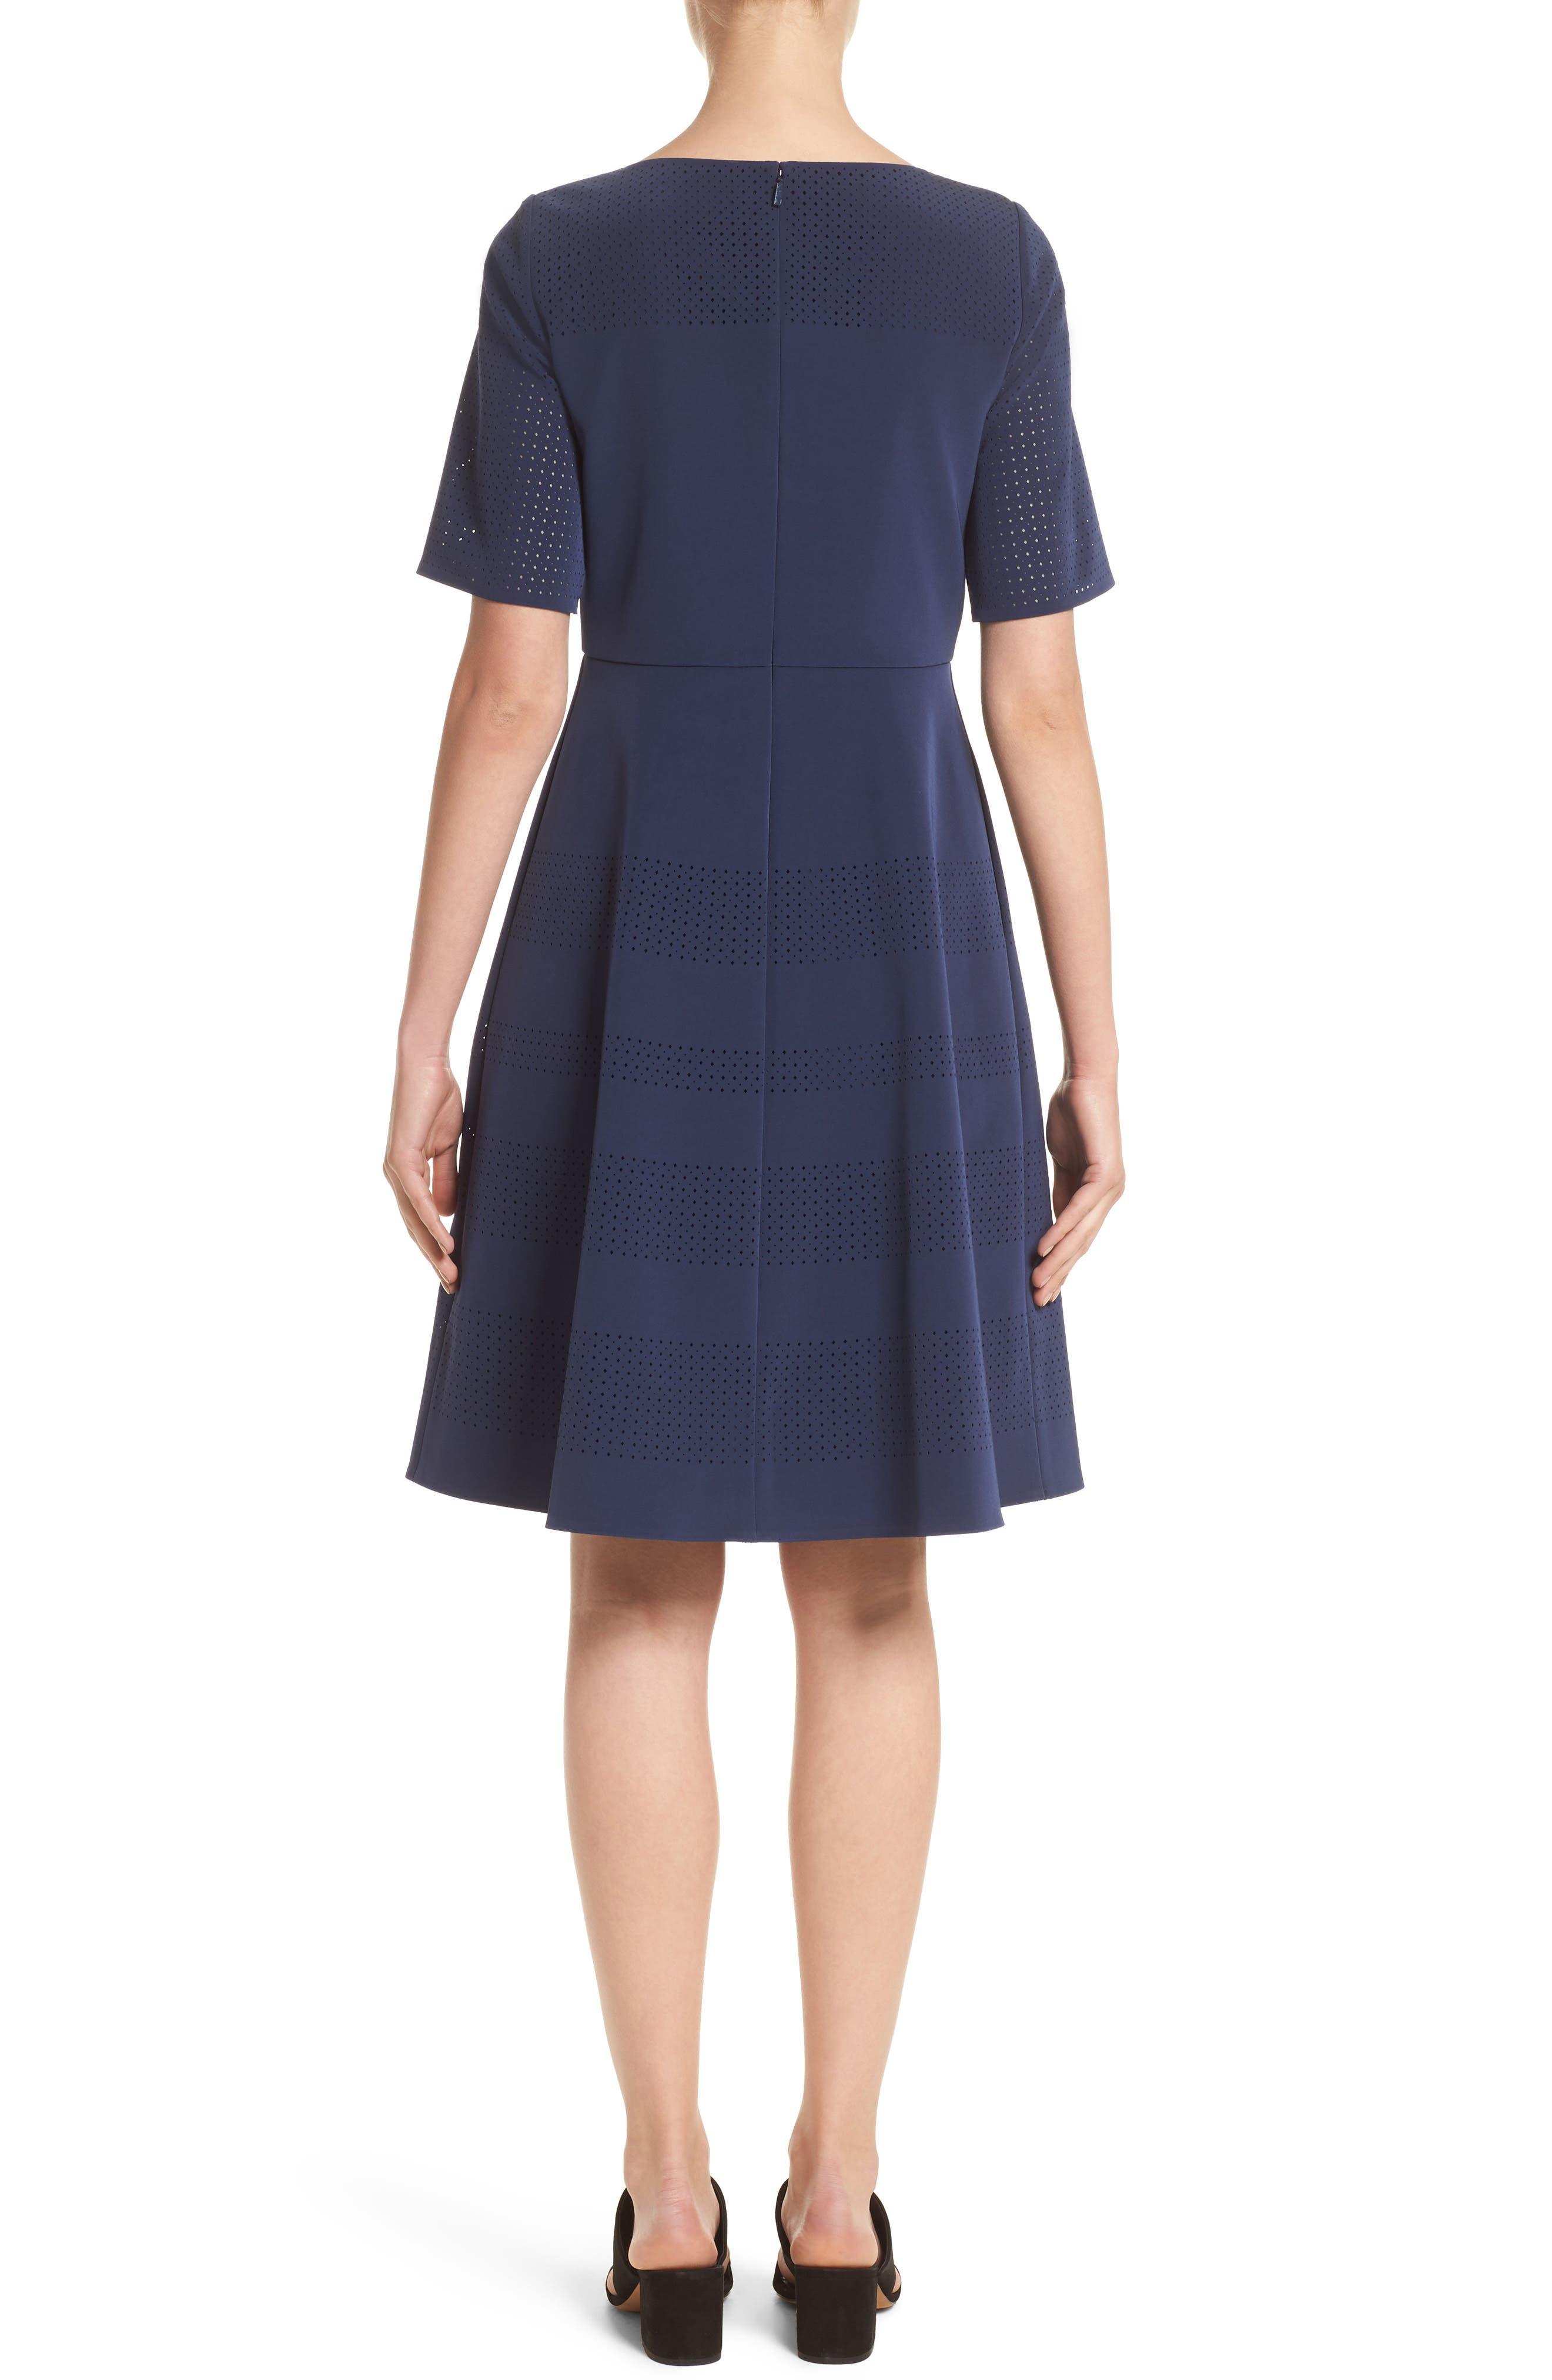 Alternate Image 2  - Lafayette 148 New York Tamera Perforated Fit & Flare Dress